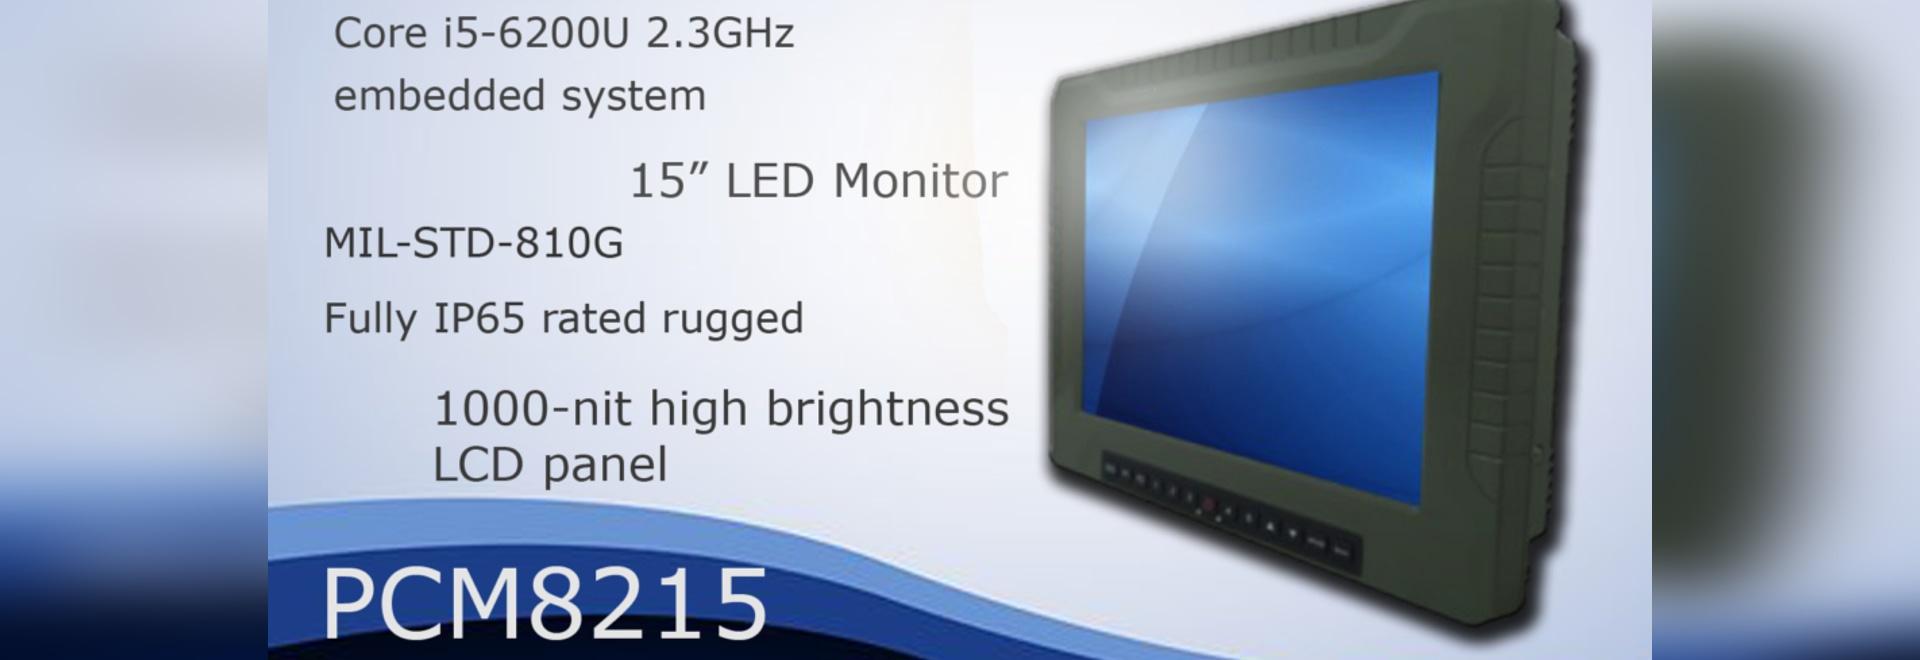 PCM8215: Militärgrad 15 Zoll Platte PC trieb durch 6. Generations-Kern i5-6200U 2.3GHz CPU an